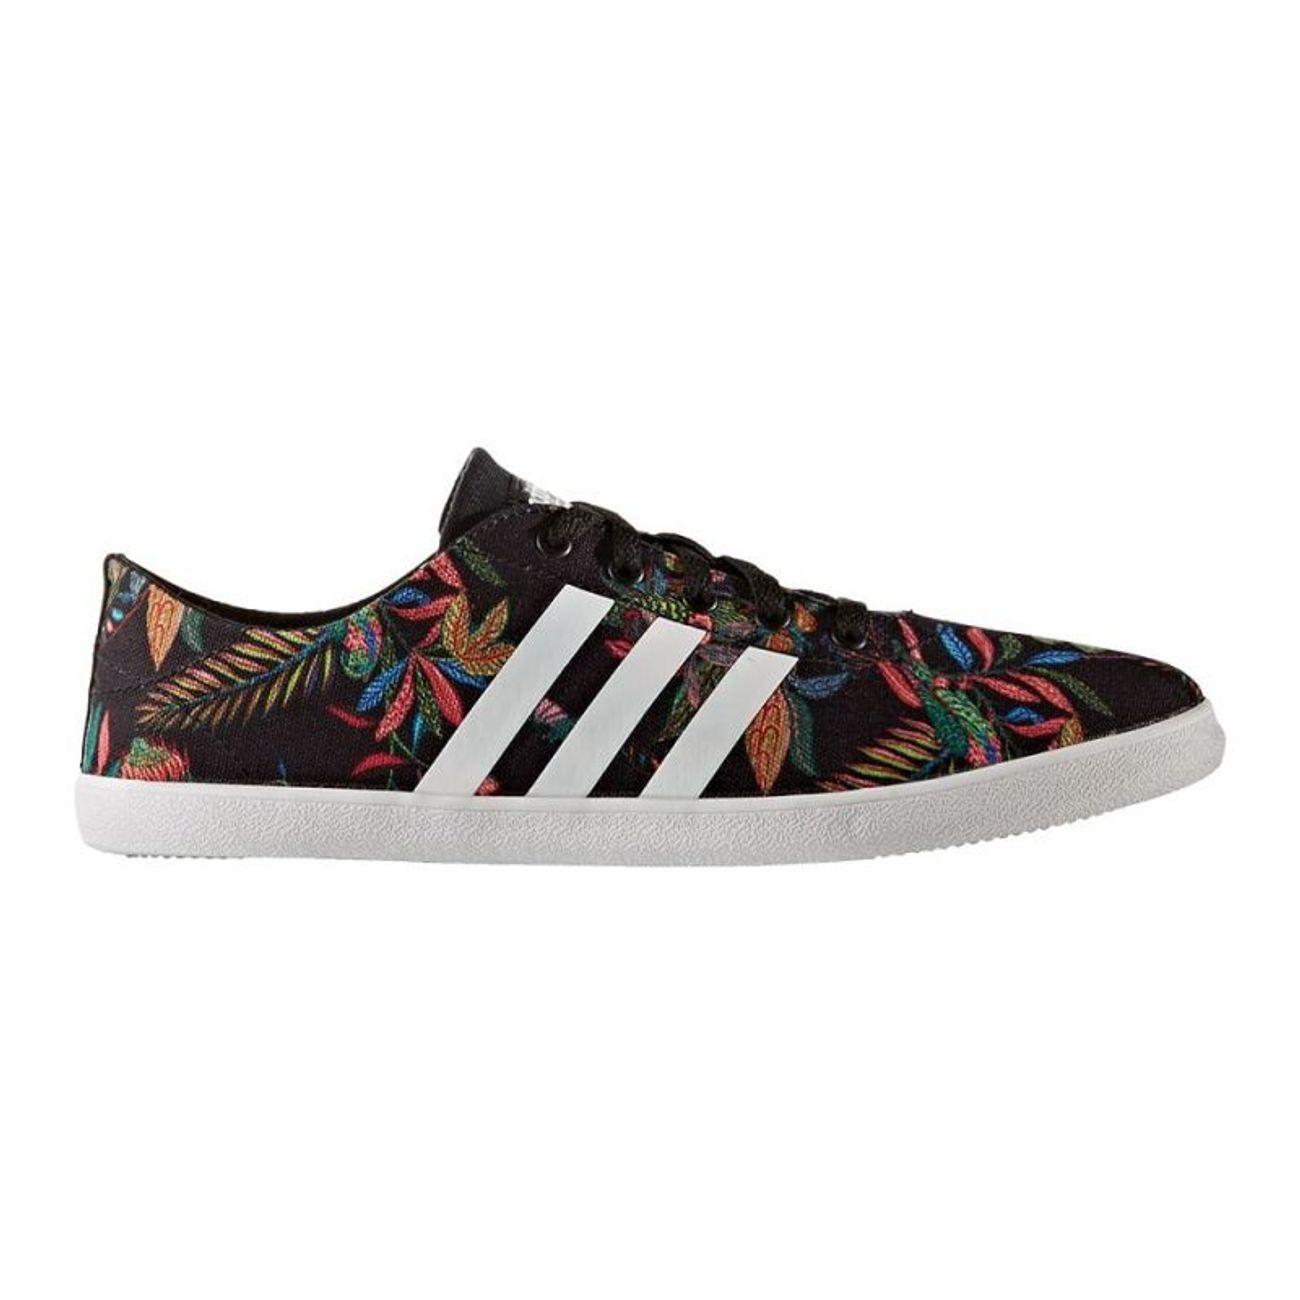 uk cheap sale wholesale sales good service adidas neo homme go sport